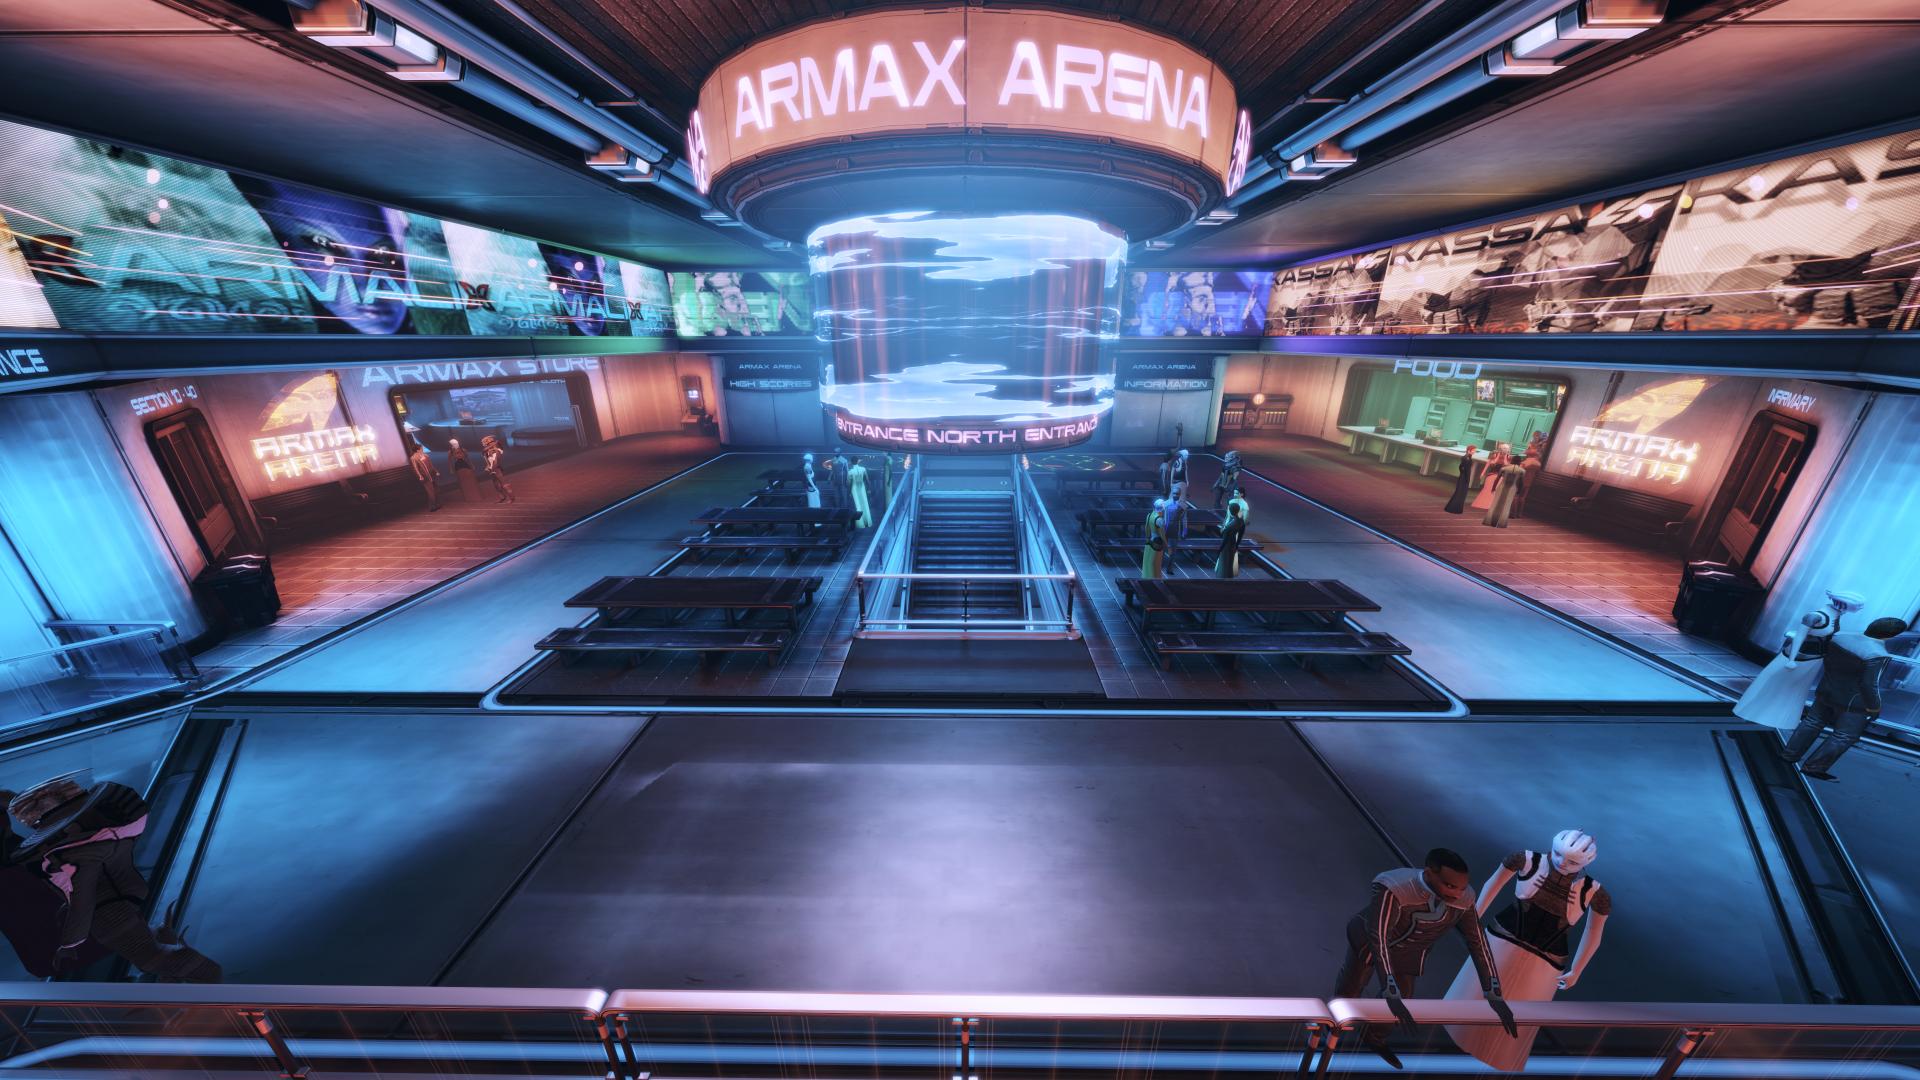 Armax Arsenal Arena